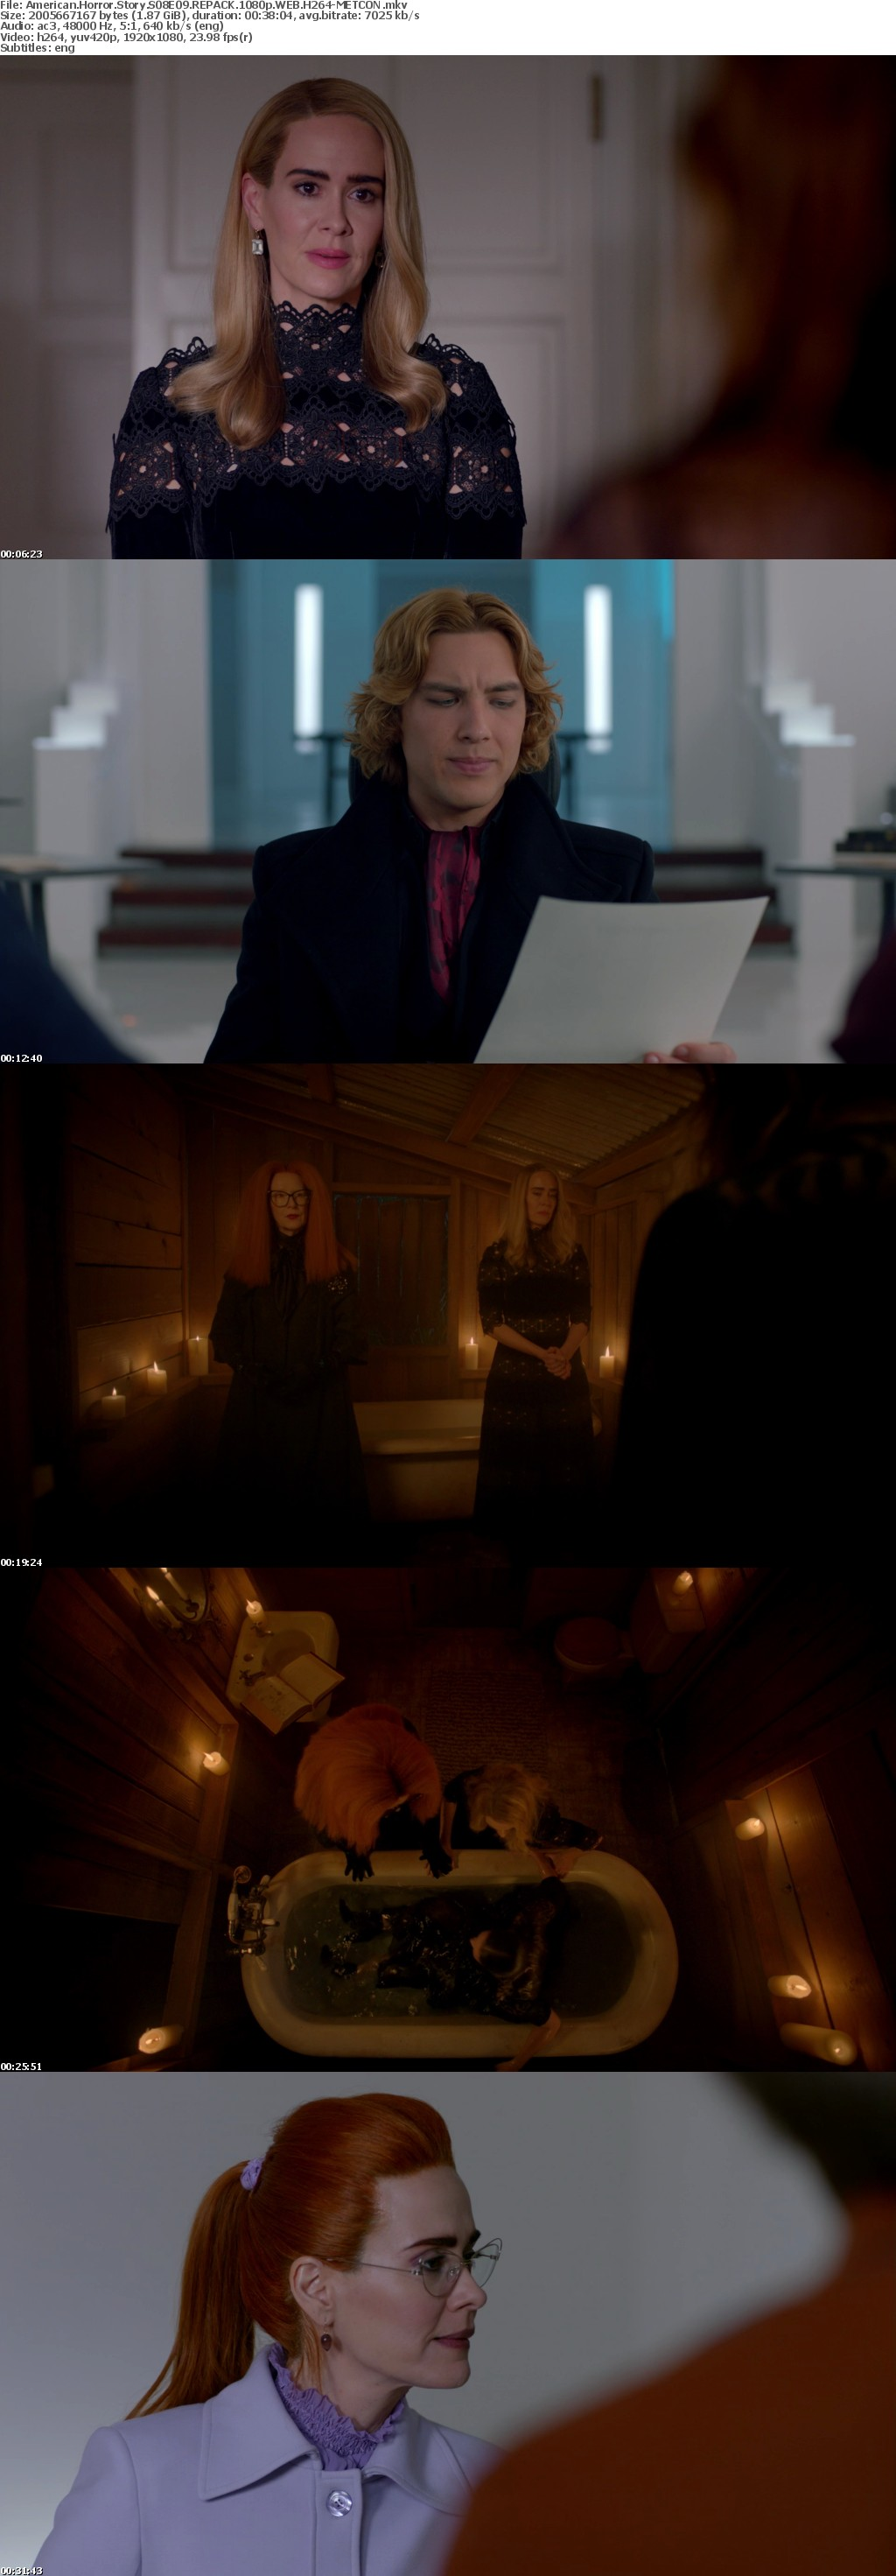 American Horror Story S08E09 REPACK 1080p WEB H264-METCON